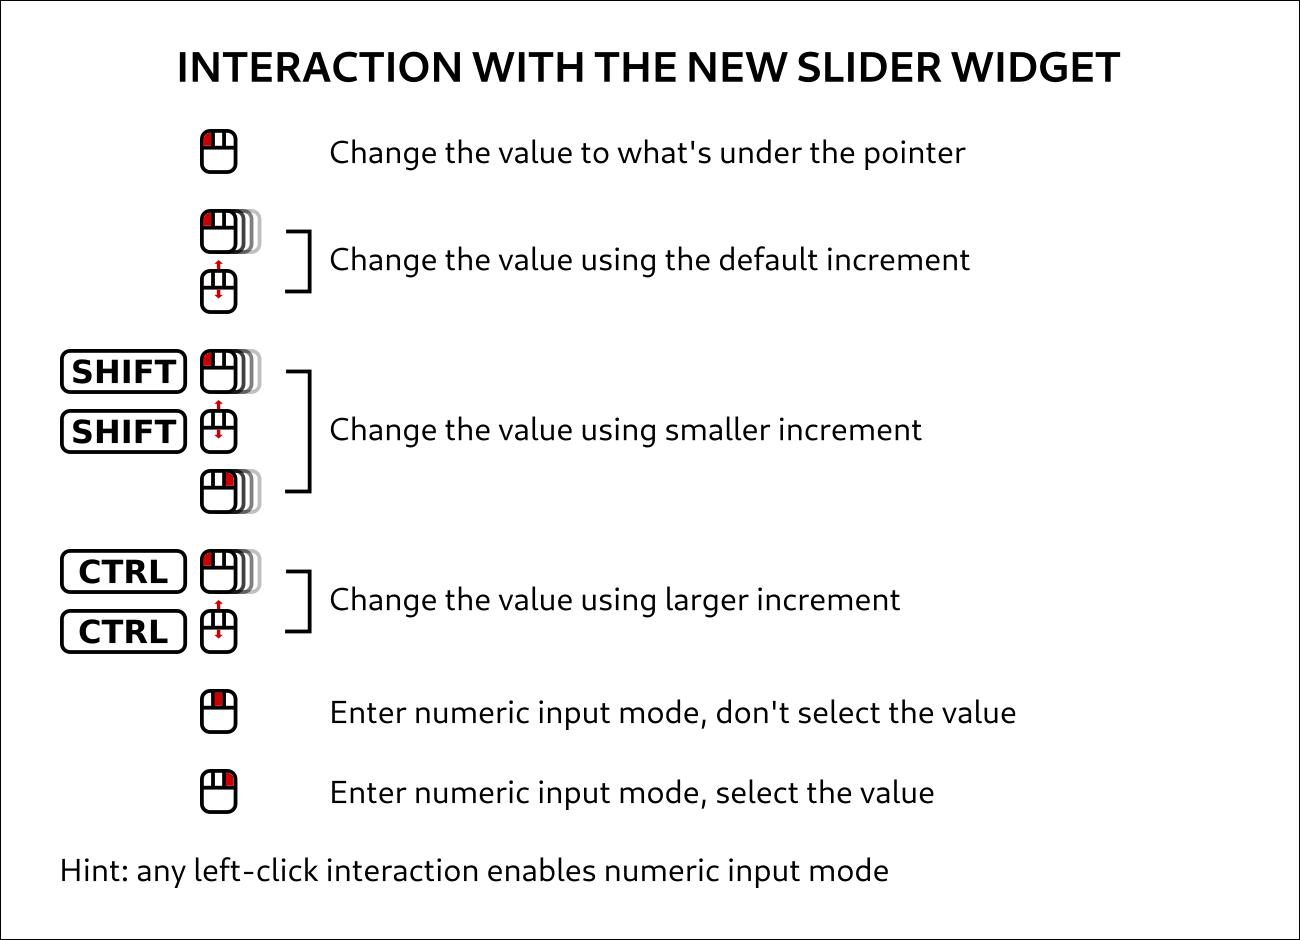 New interaction model for the slider widget